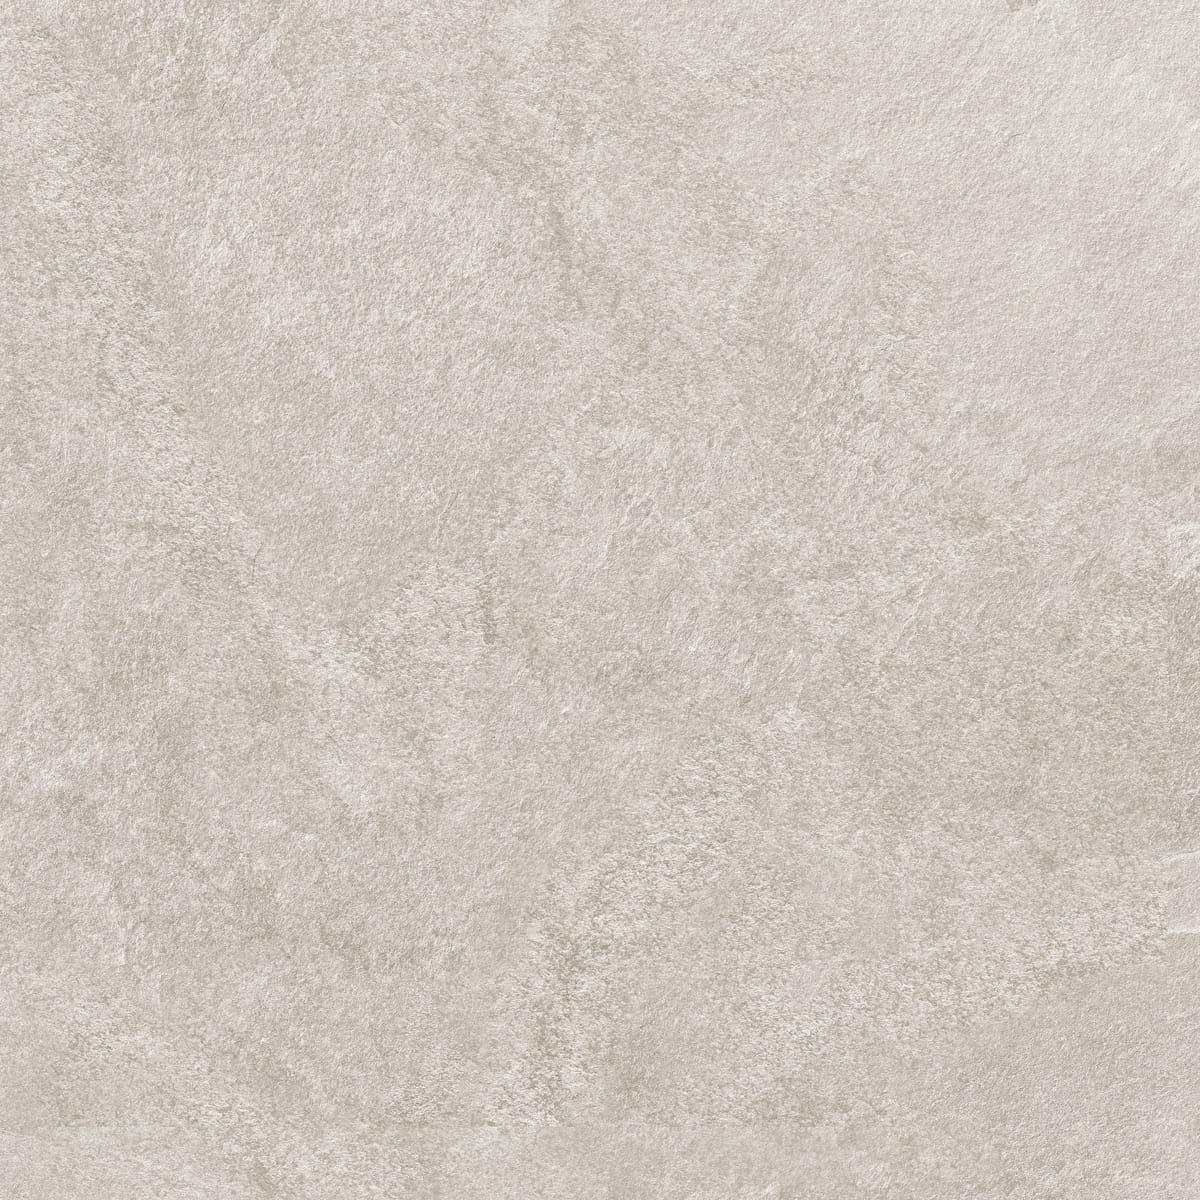 FOTO basalt marfil antideslizante 59x59